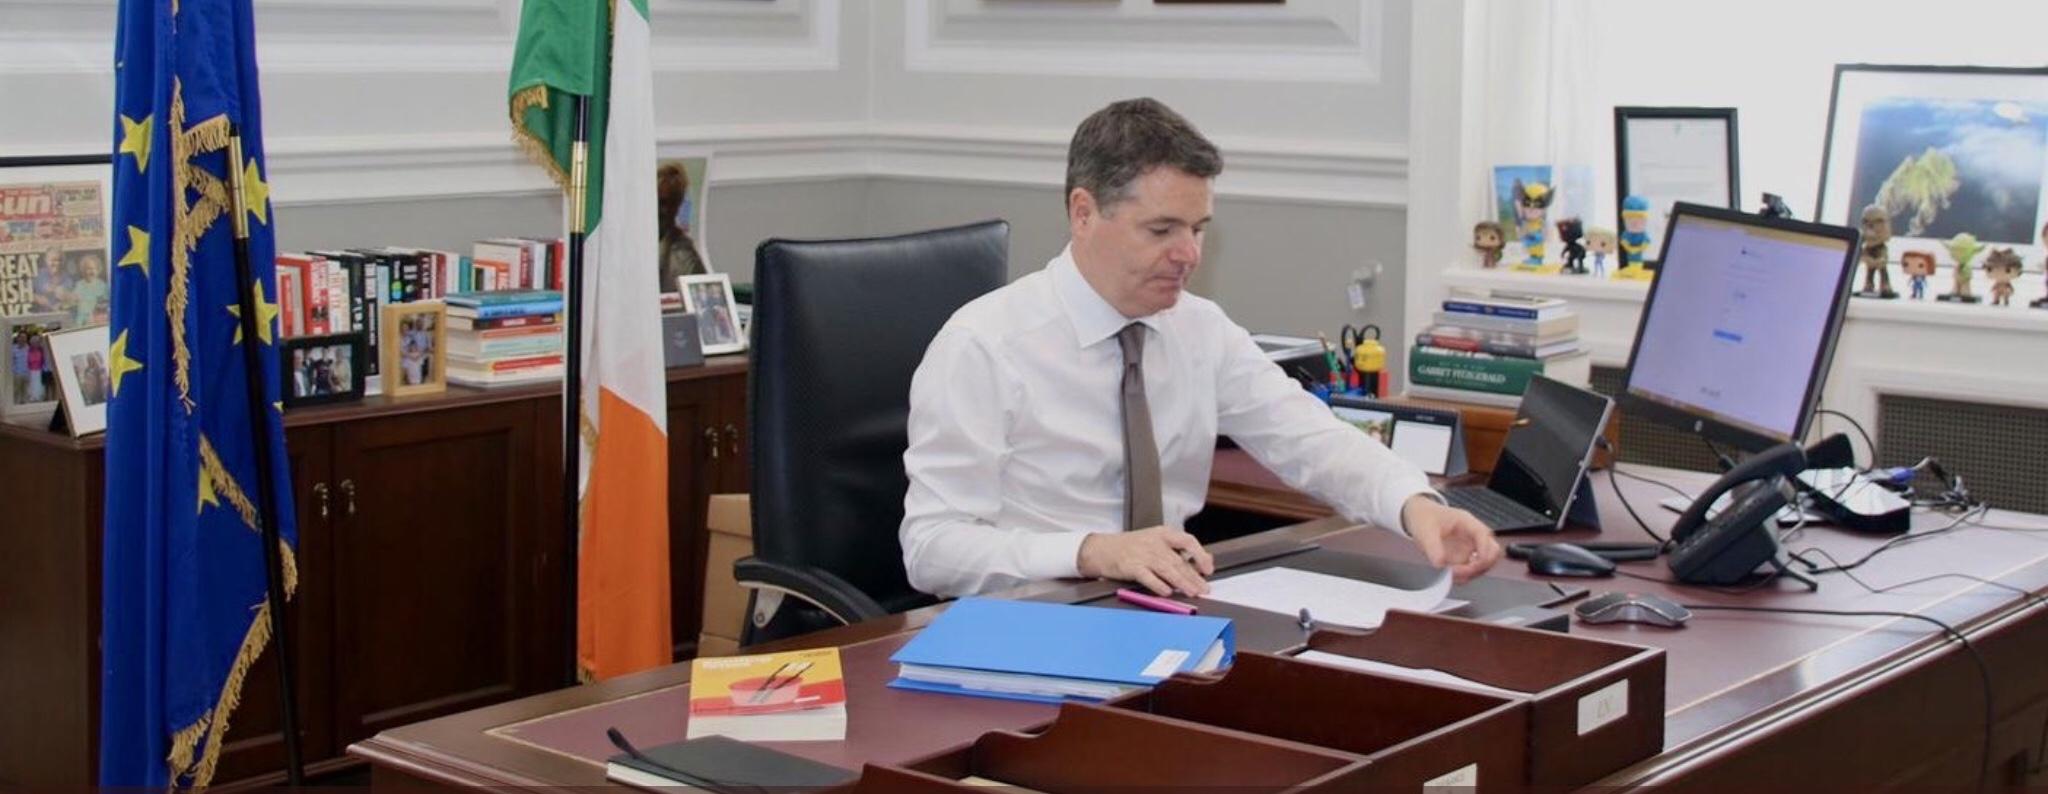 Paschal Donohoe new Eurogroup president